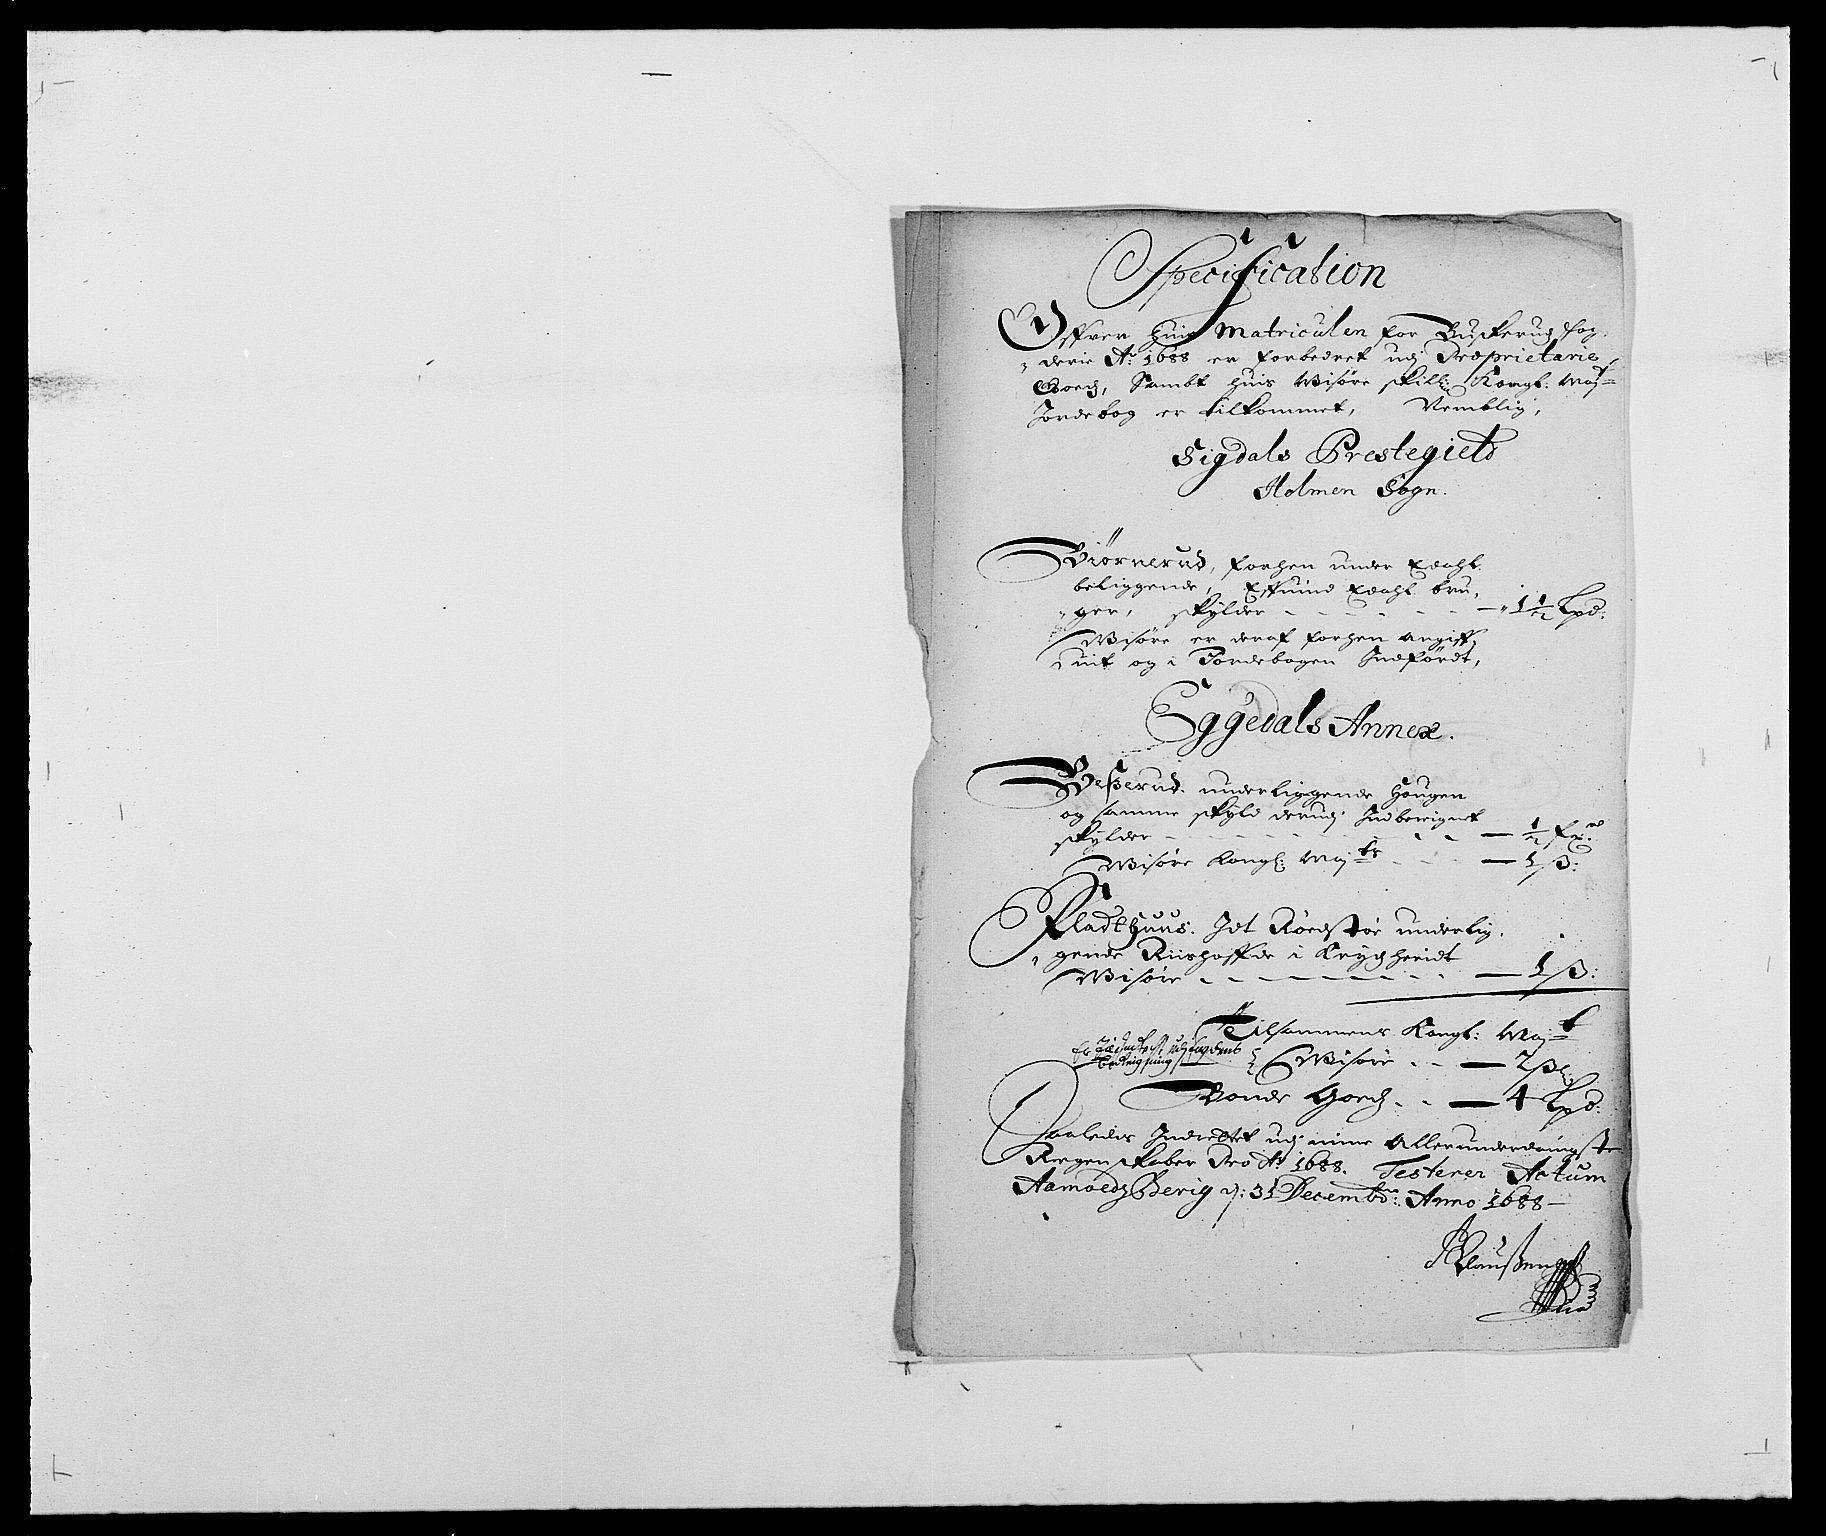 RA, Rentekammeret inntil 1814, Reviderte regnskaper, Fogderegnskap, R25/L1679: Fogderegnskap Buskerud, 1687-1688, s. 300